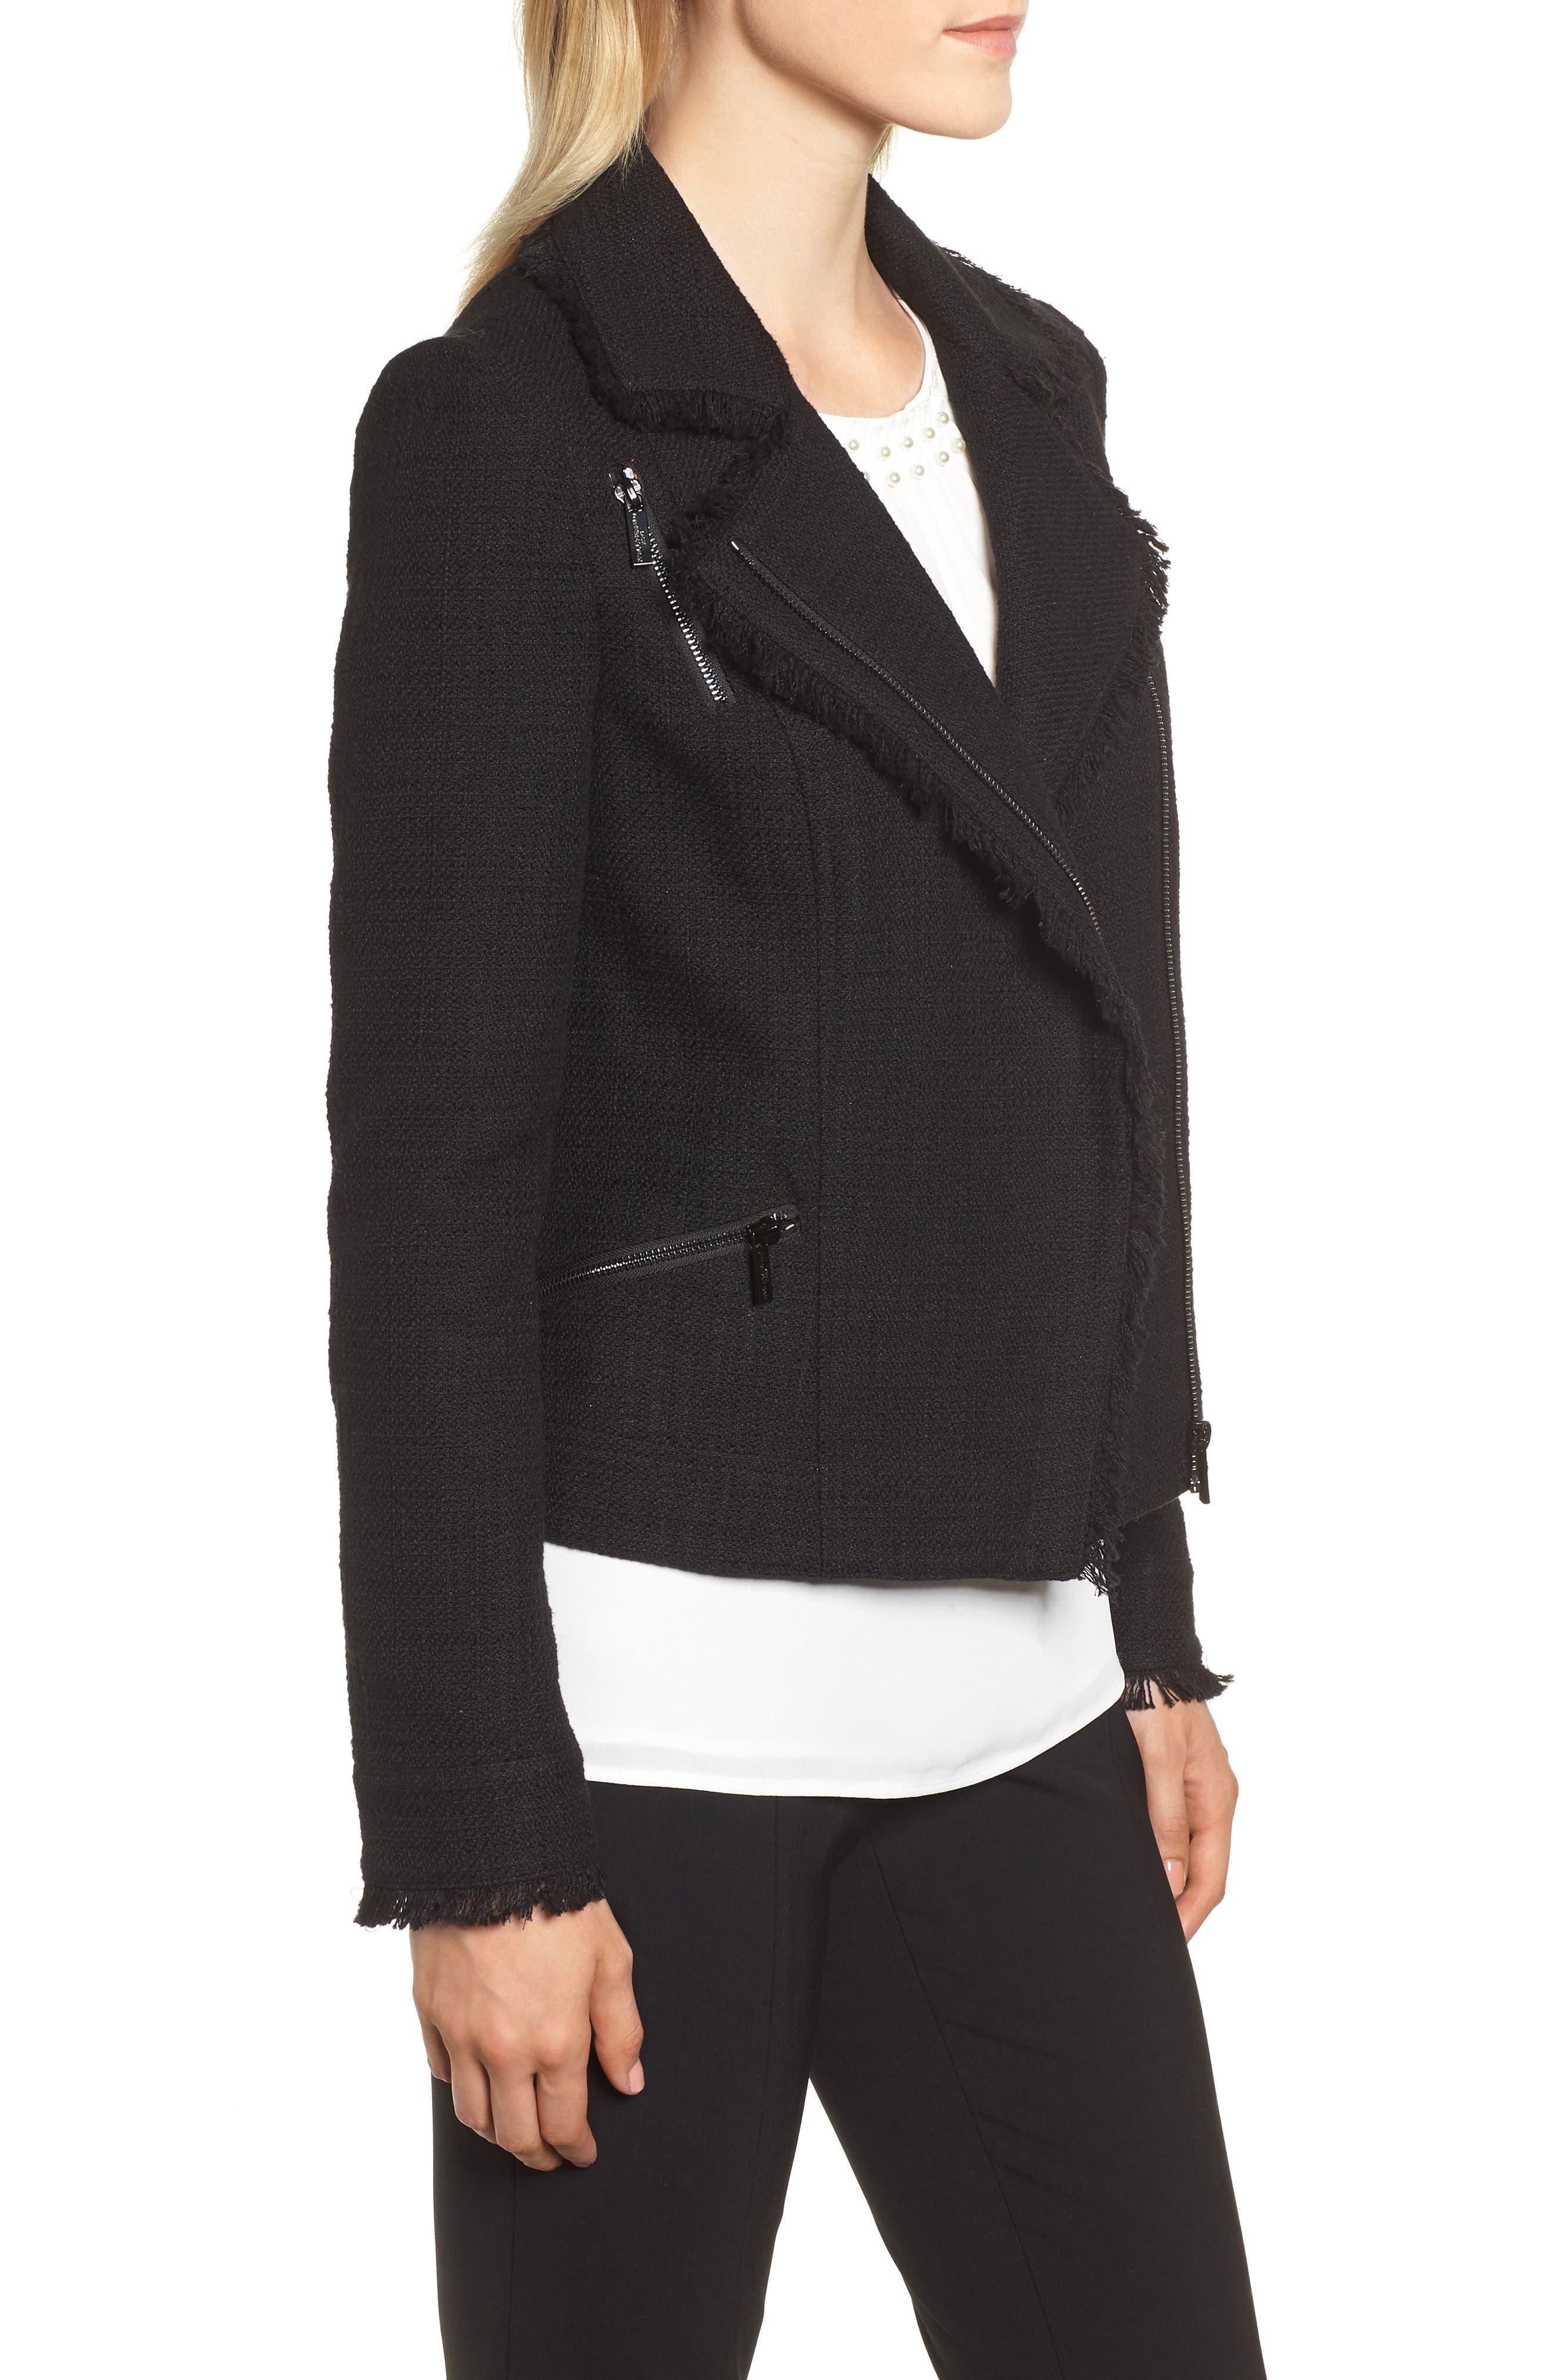 KARL LAGERFELD PARIS,                             Tweed Moto Jacket,                             Alternate thumbnail 4, color,                             001